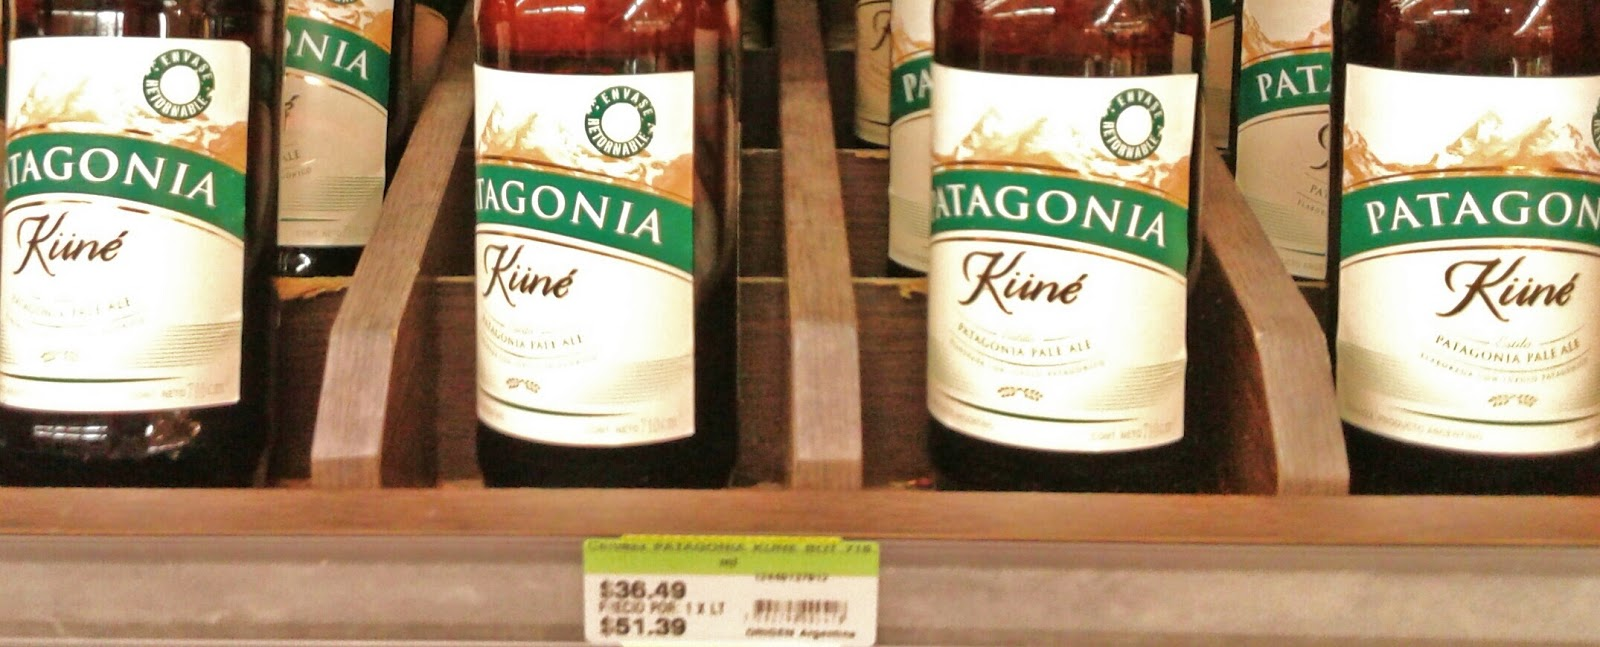 Cerveza patagonia kune